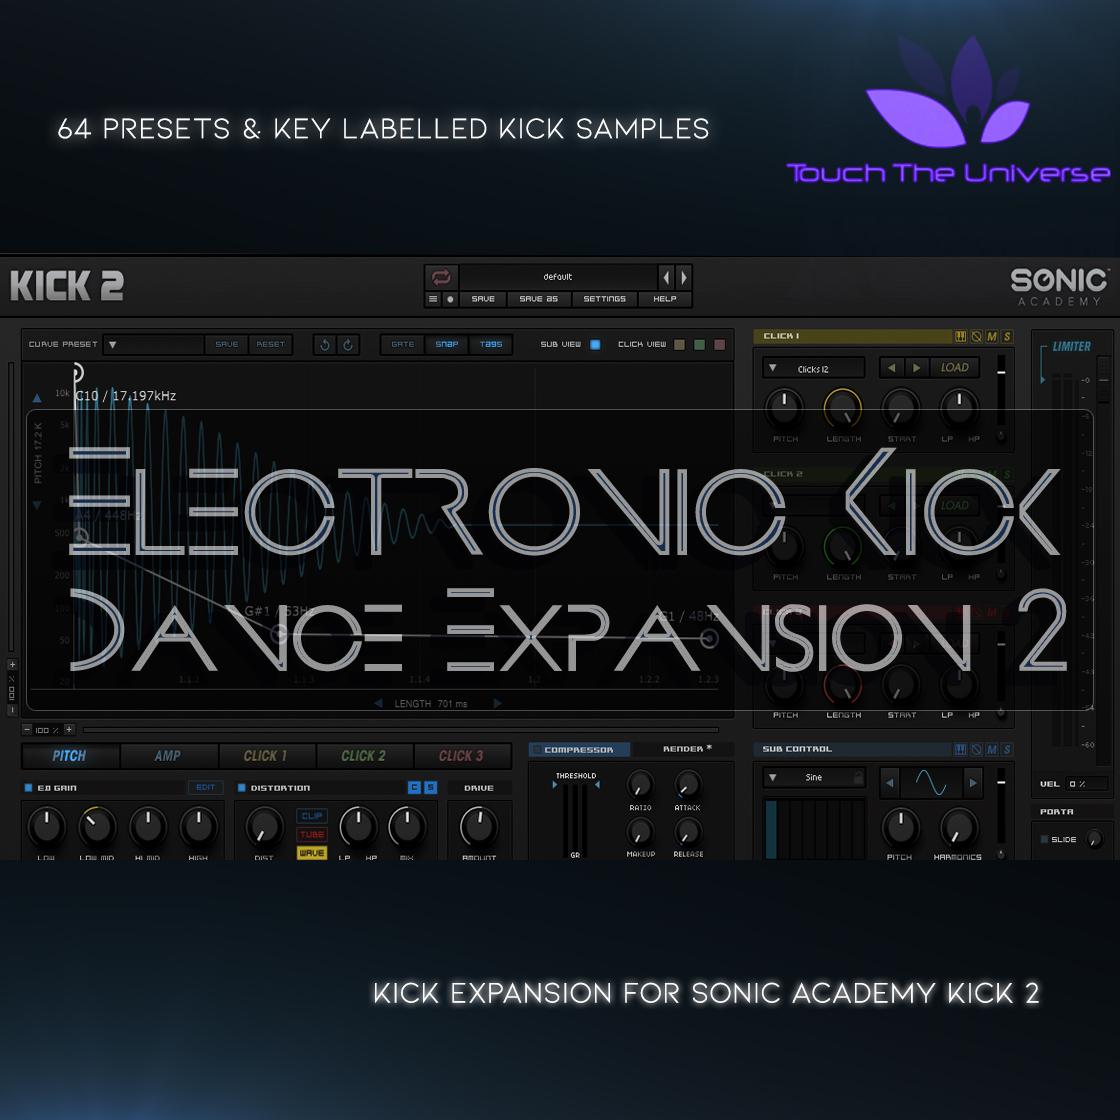 Electronic Dance Kick Expansion Vol.2 for Sonic Academy Kick 2